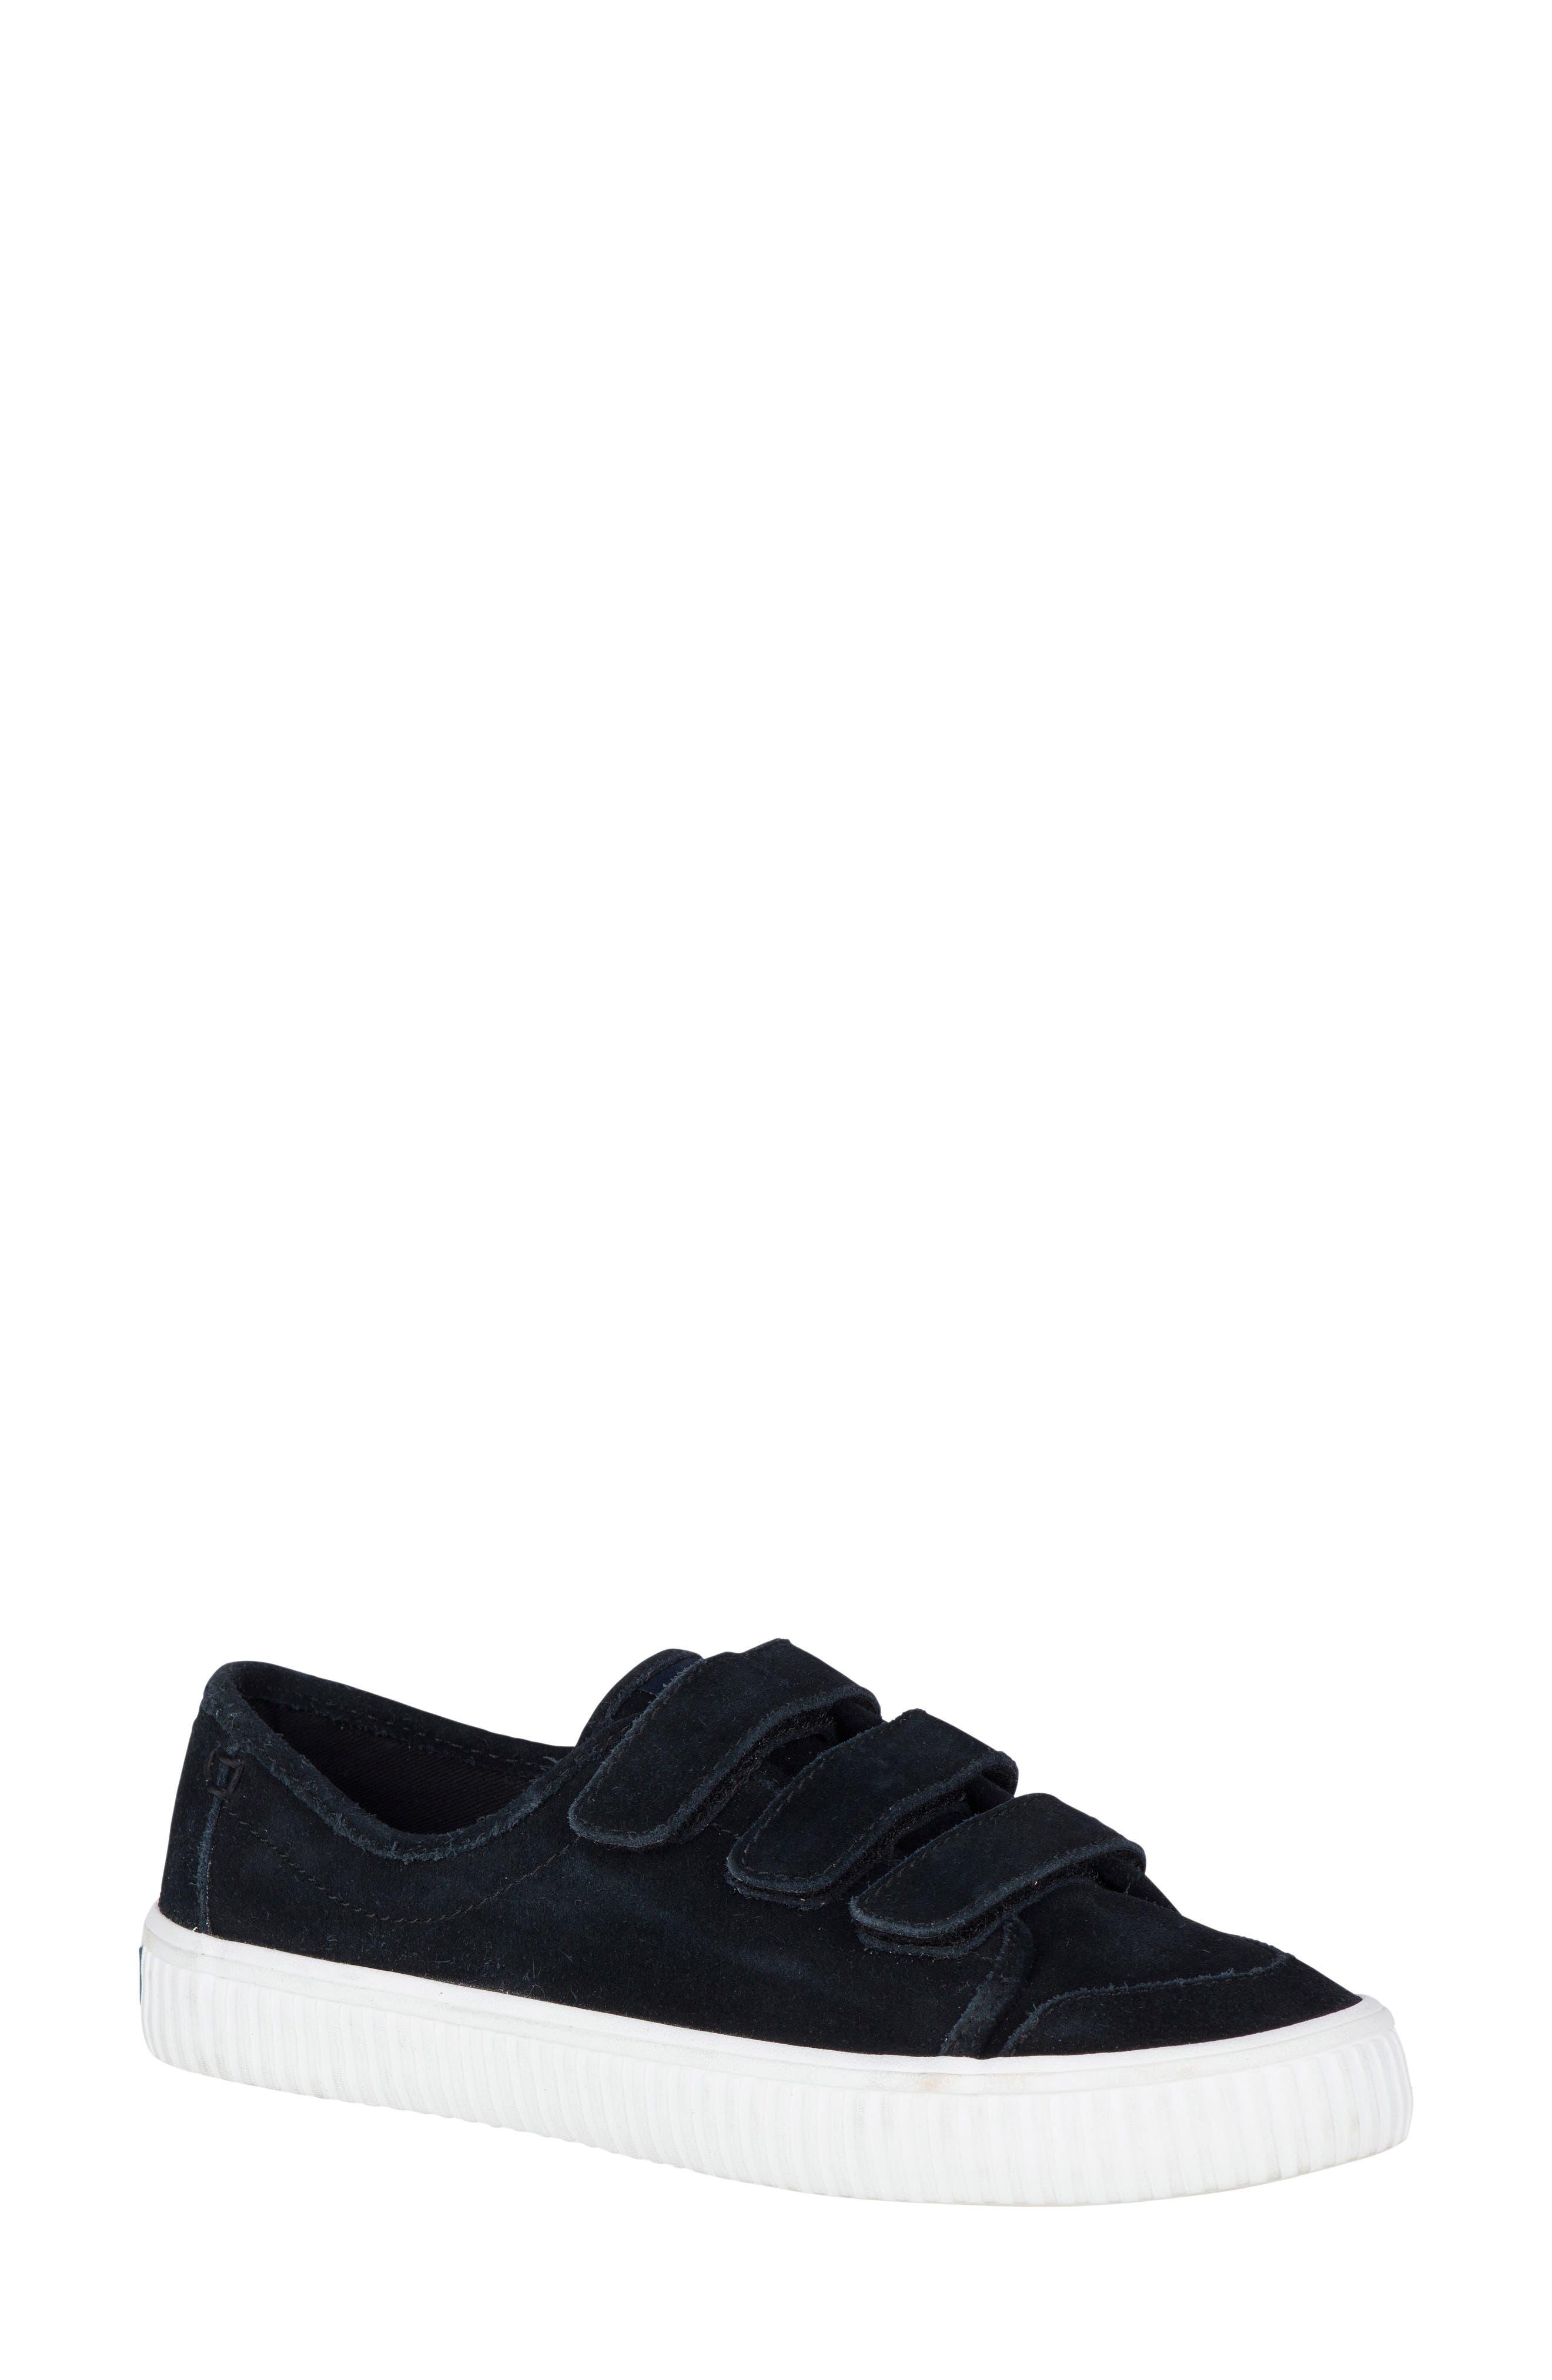 Creeper Sneaker,                         Main,                         color, 001